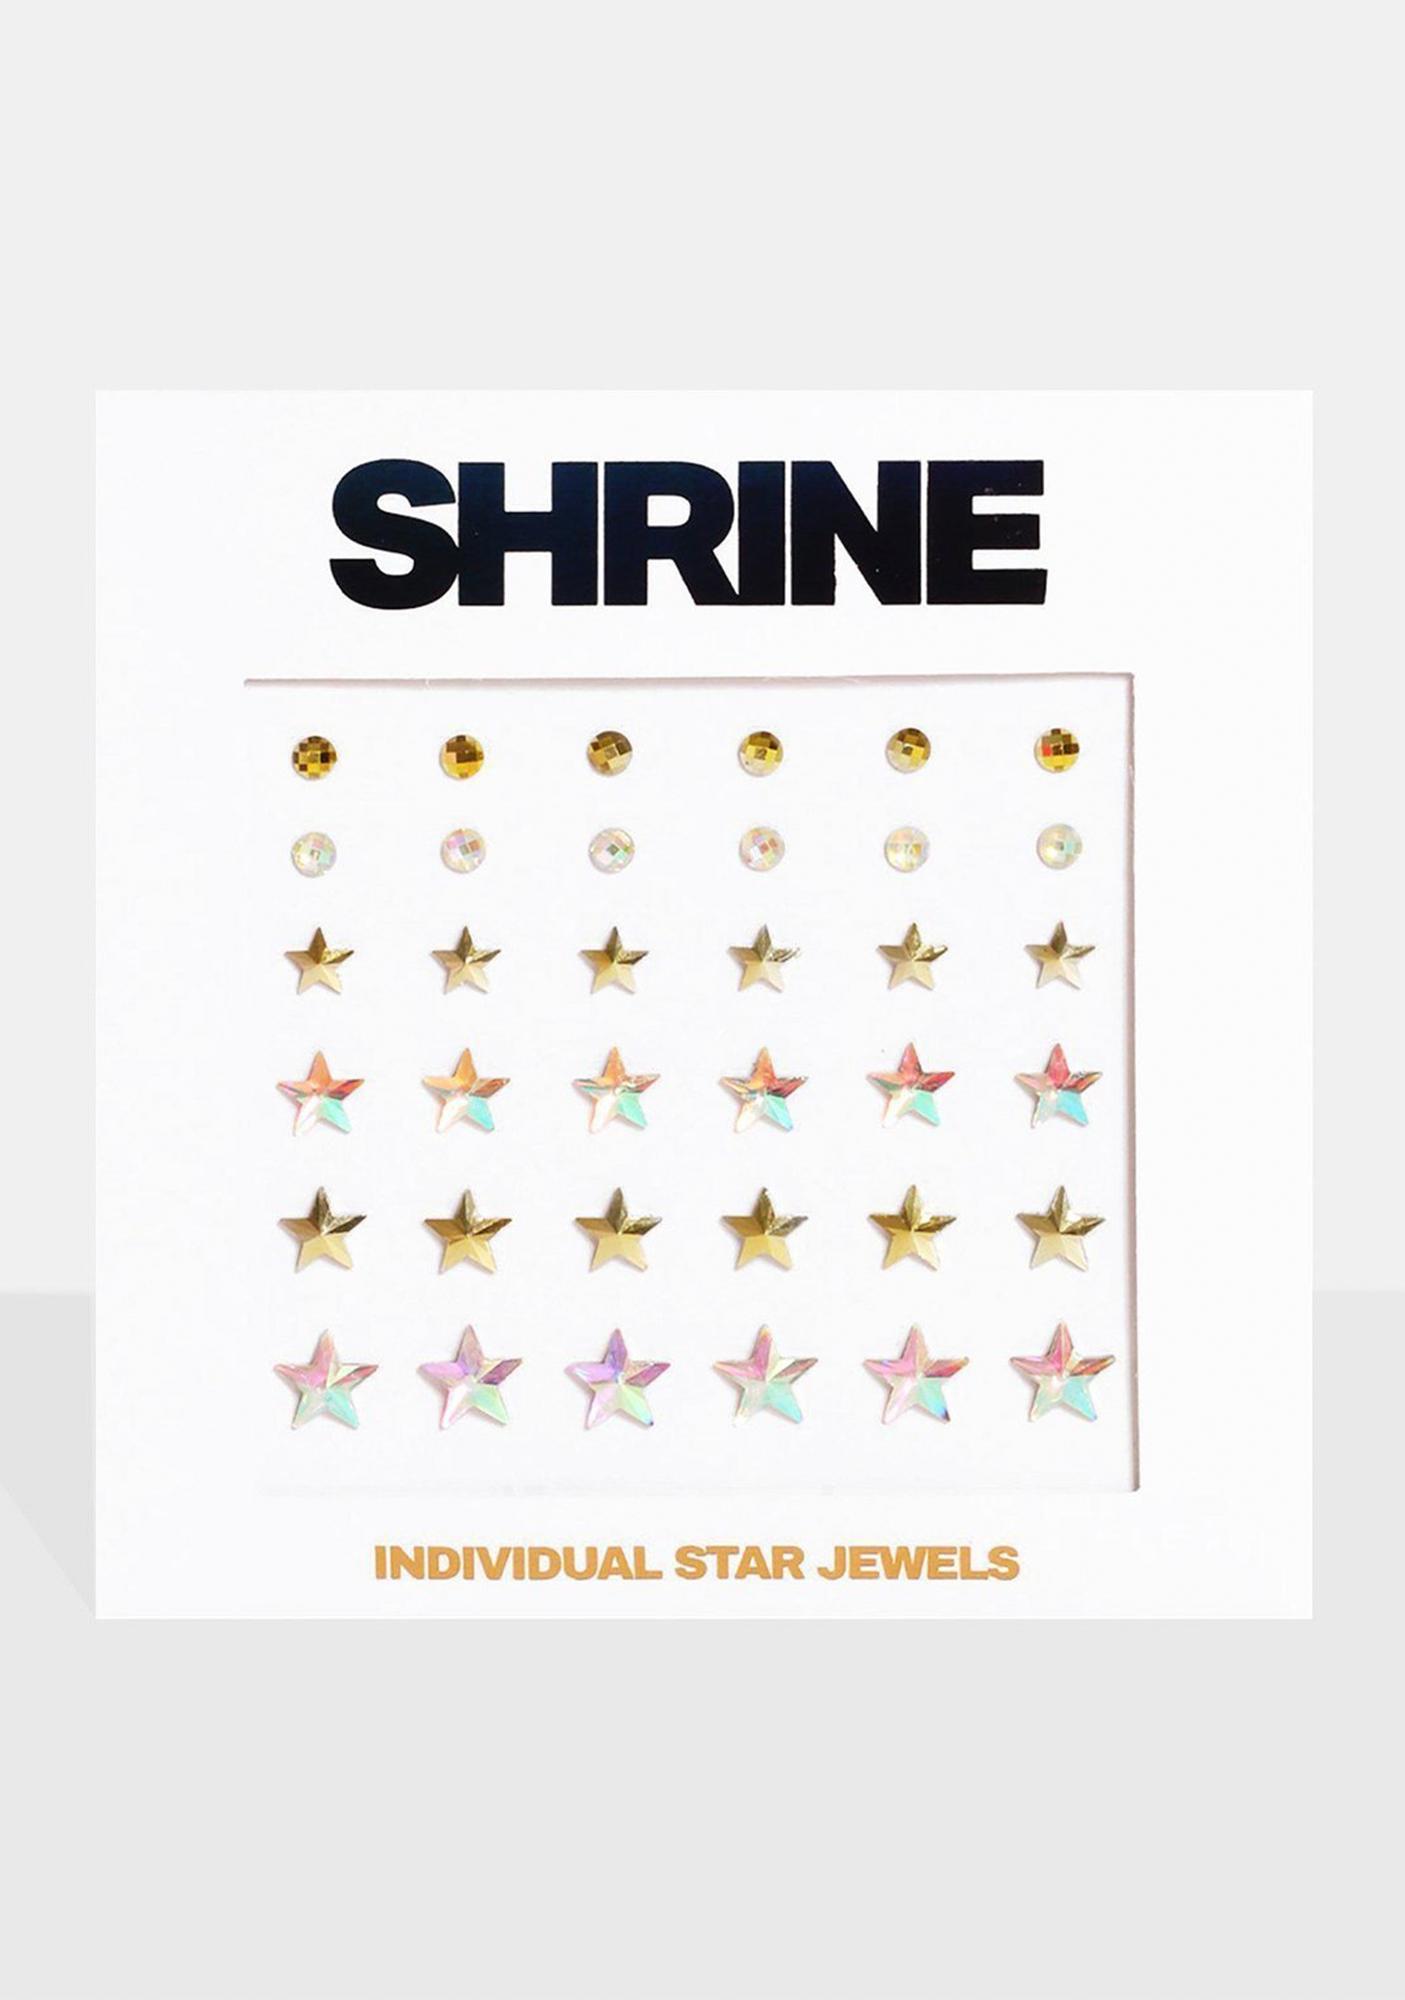 SHRINE Individual Star Face Jewels